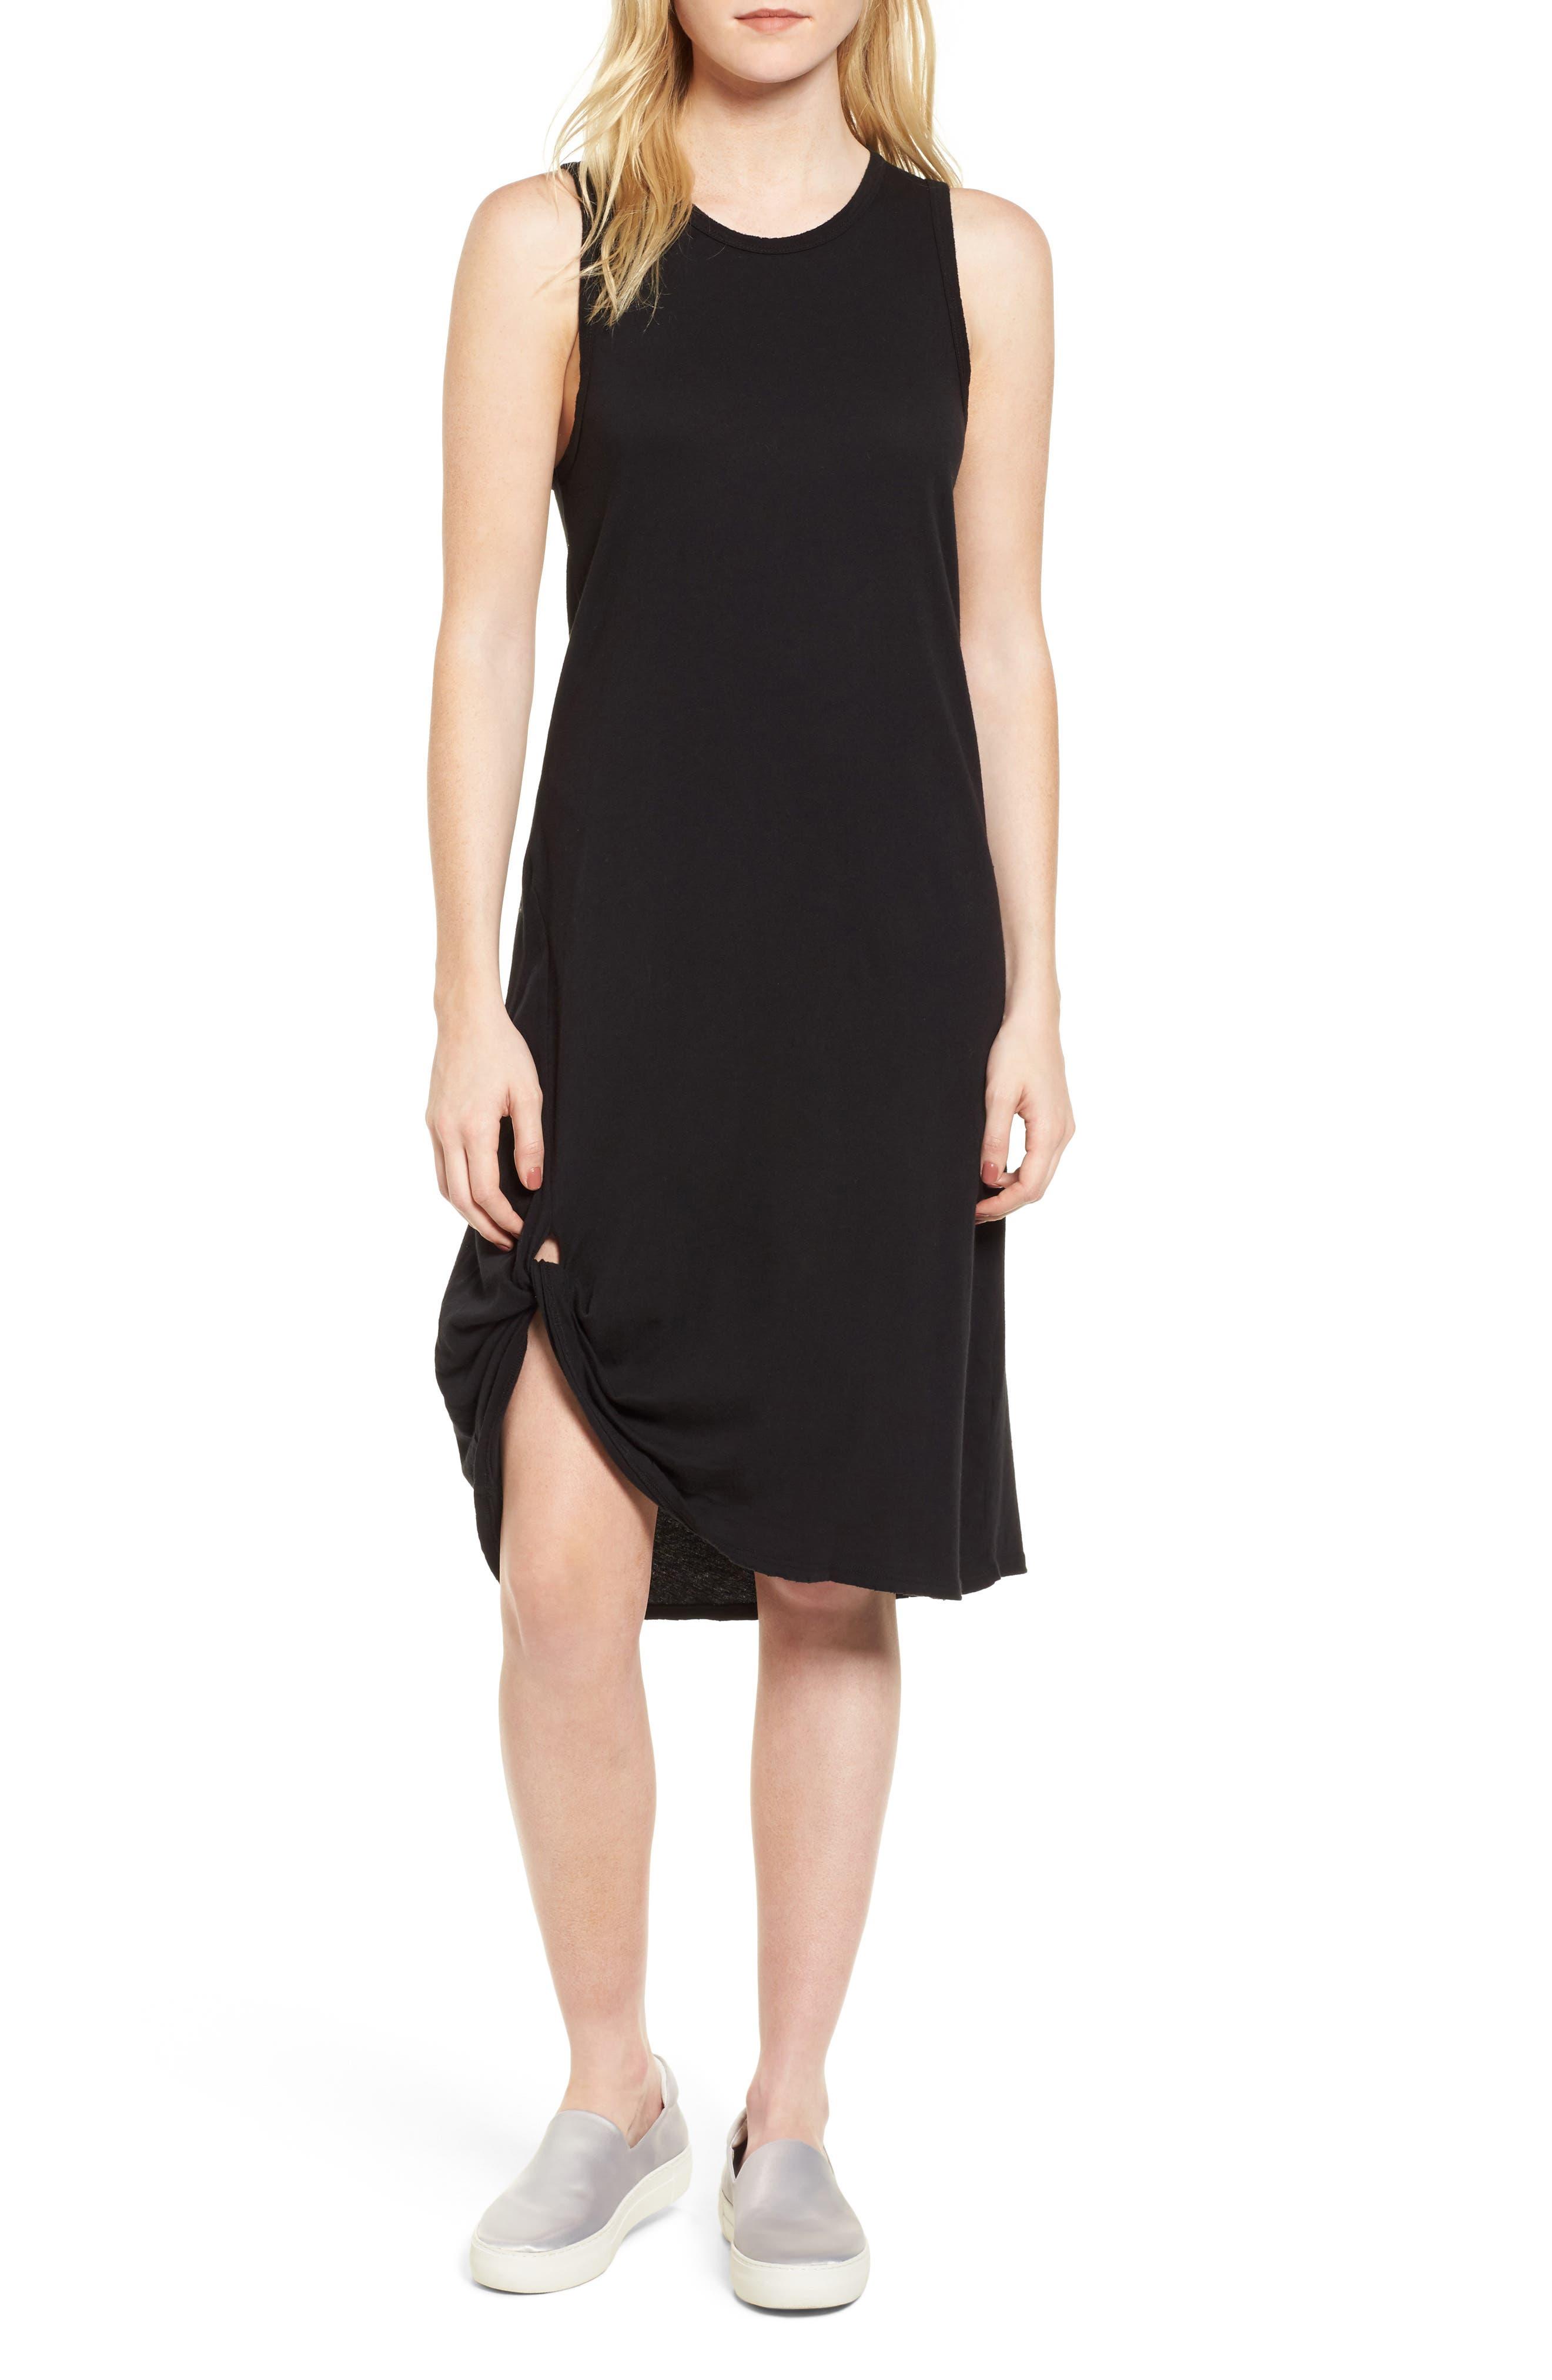 Boo Jersey Tank Dress,                         Main,                         color, 001